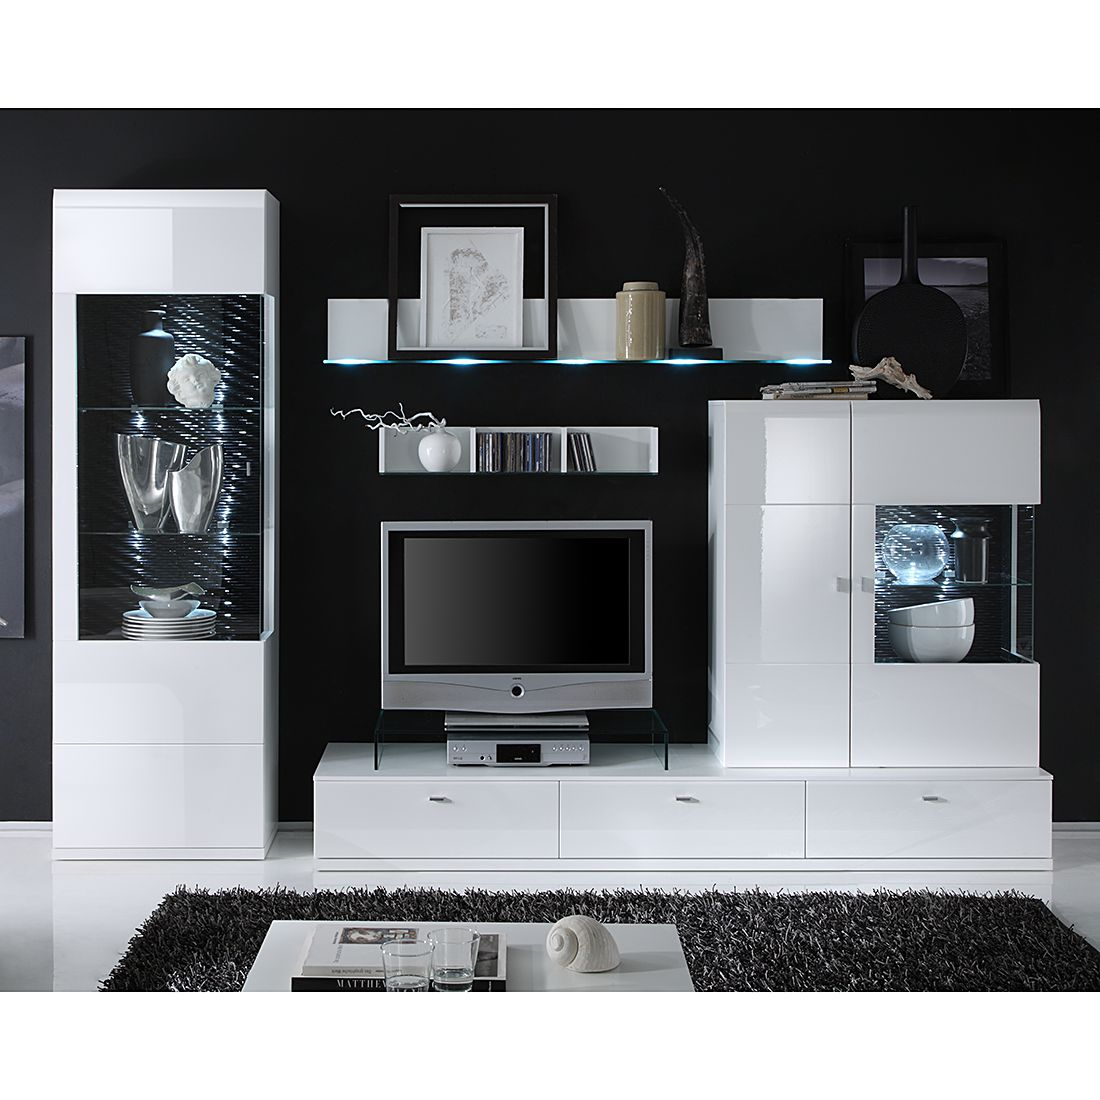 eek a wohnwand tesseo ii 4 teilig hochglanz wei absetzung schwarz mit beleuchtung tv. Black Bedroom Furniture Sets. Home Design Ideas